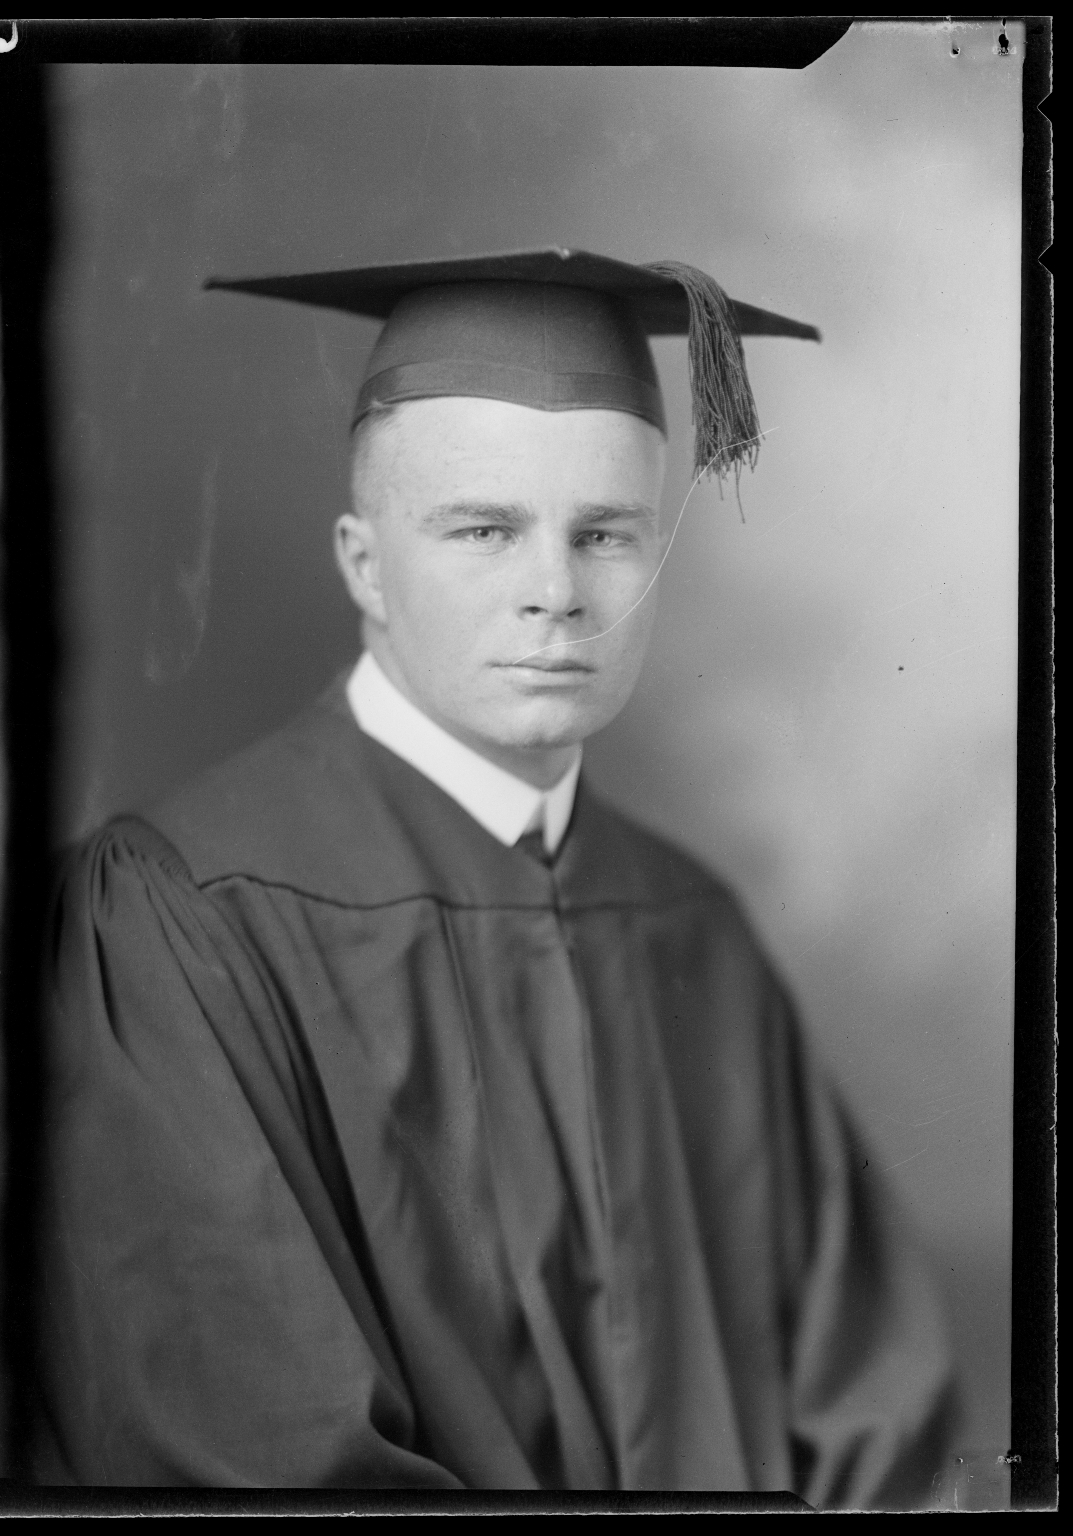 Portraits of K. Burghardt